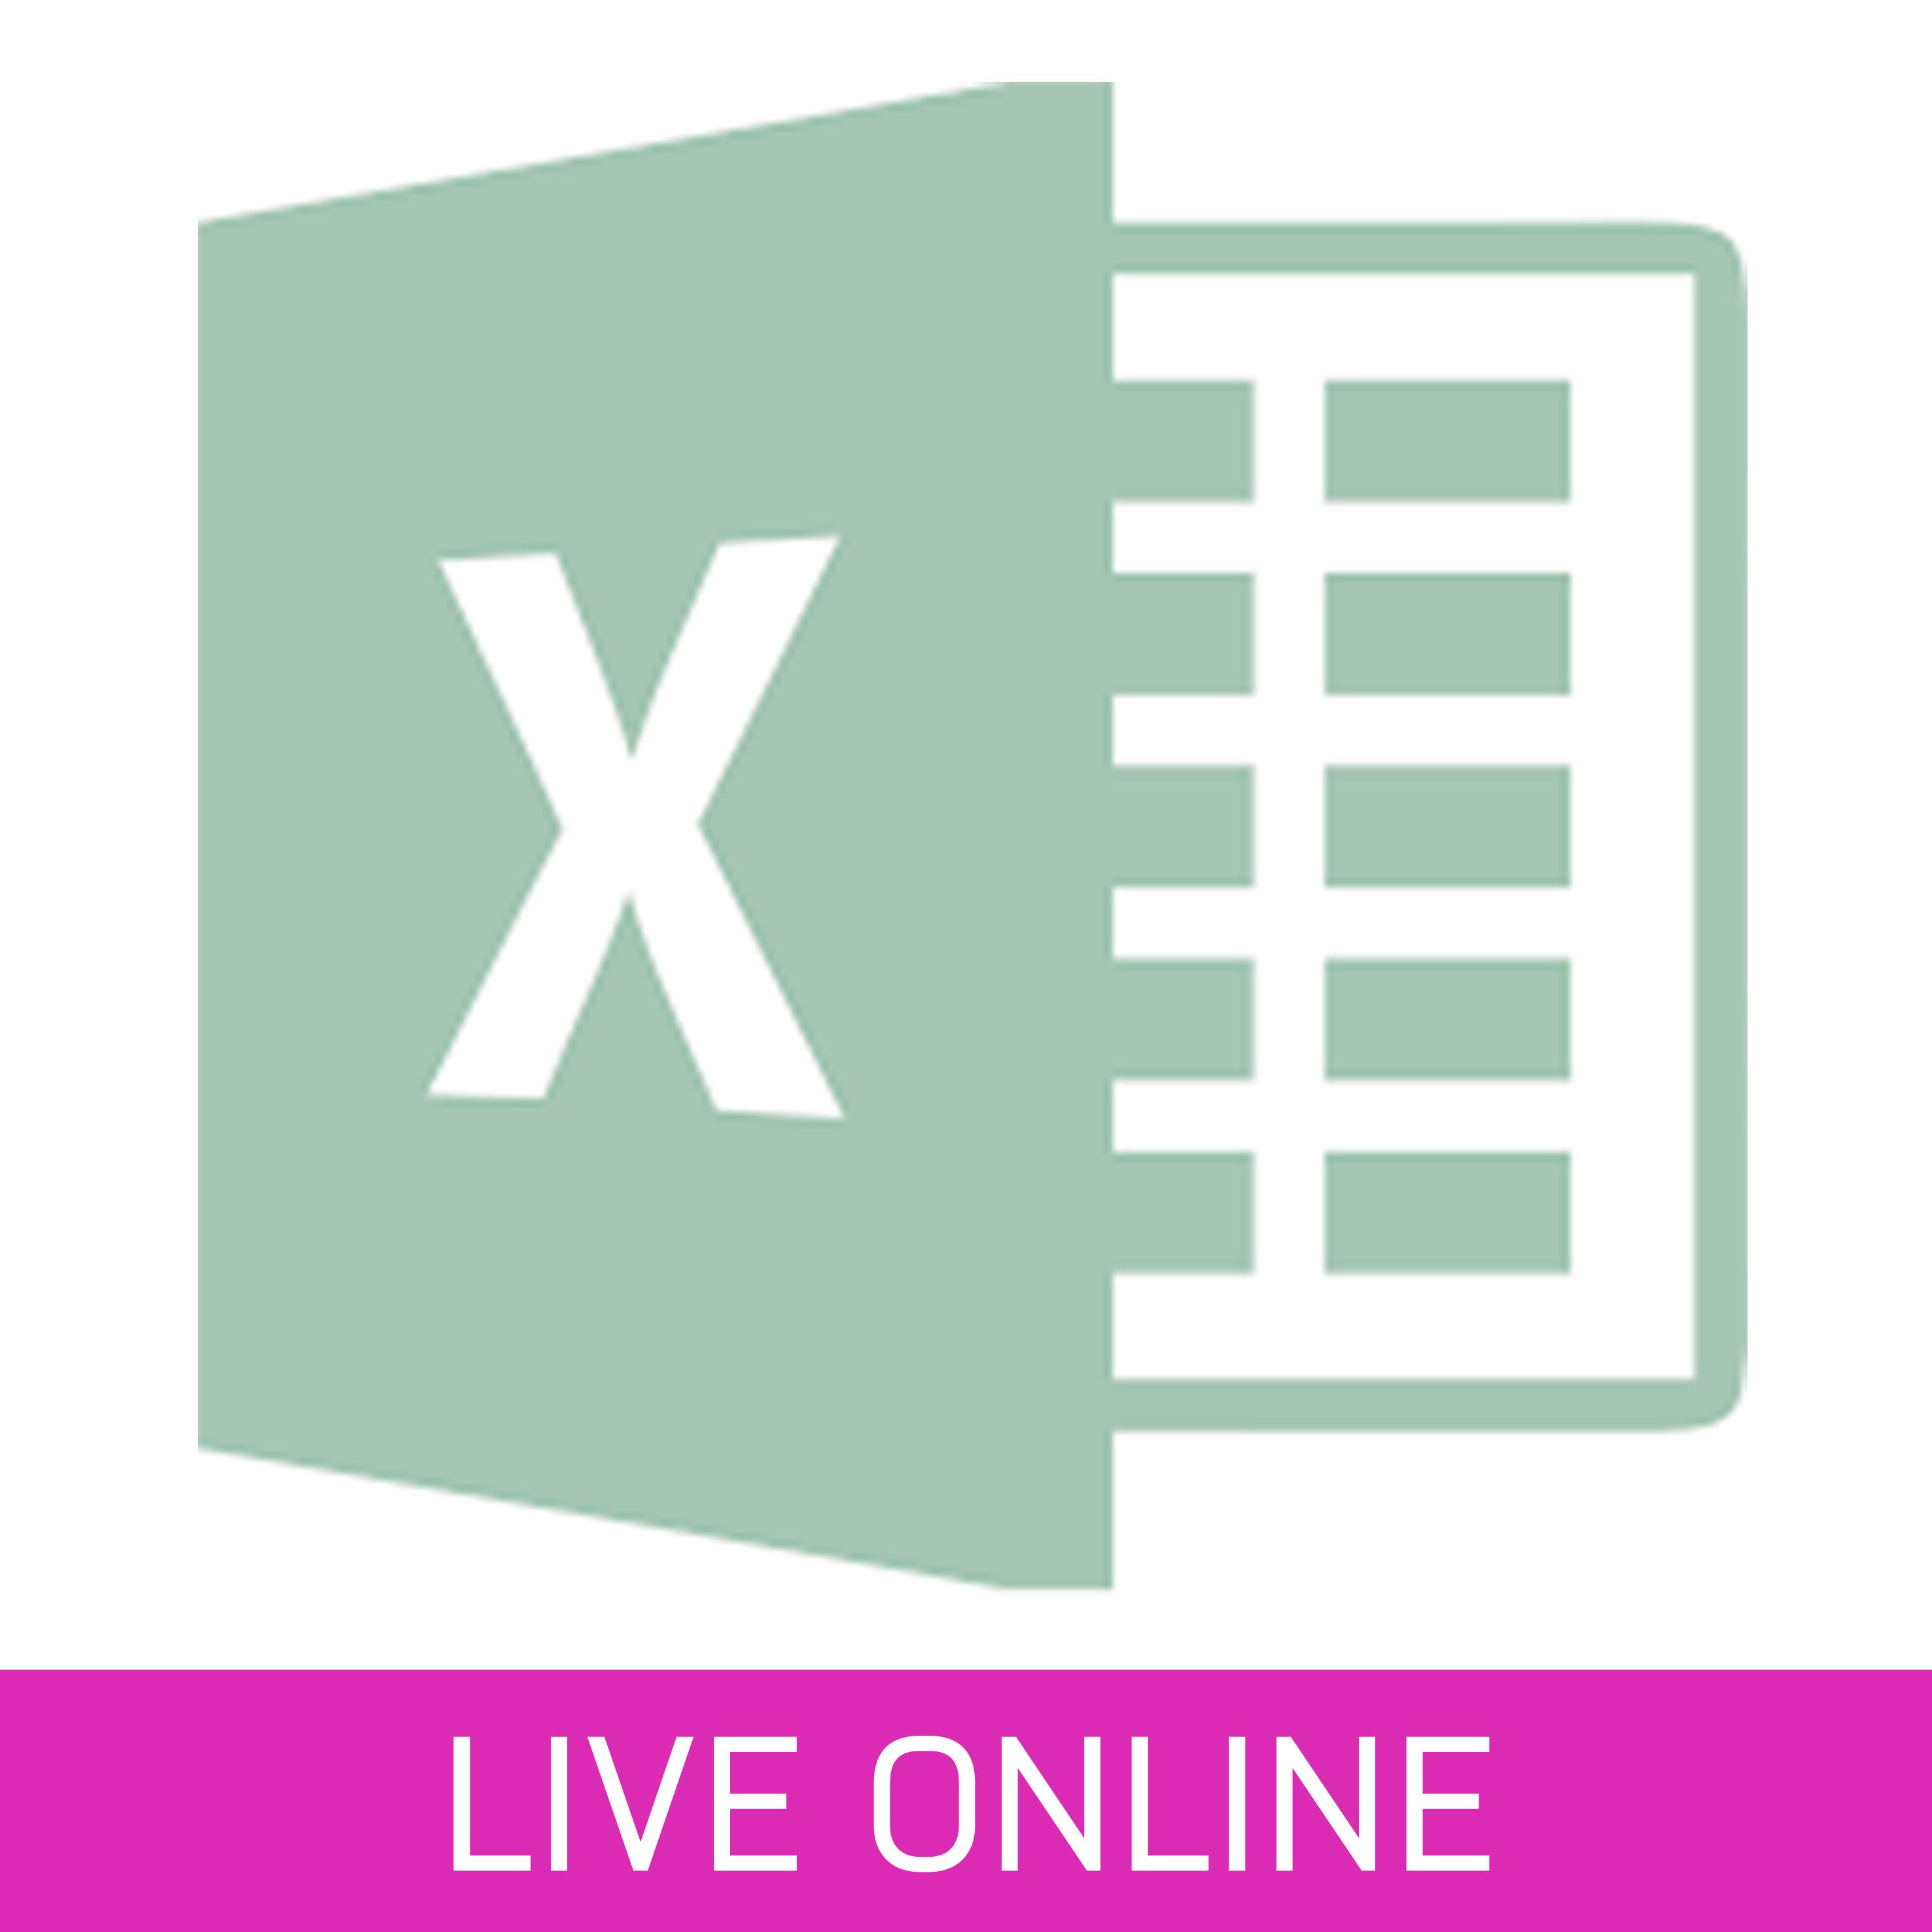 Excel_liveonline_250x250_40.jpg